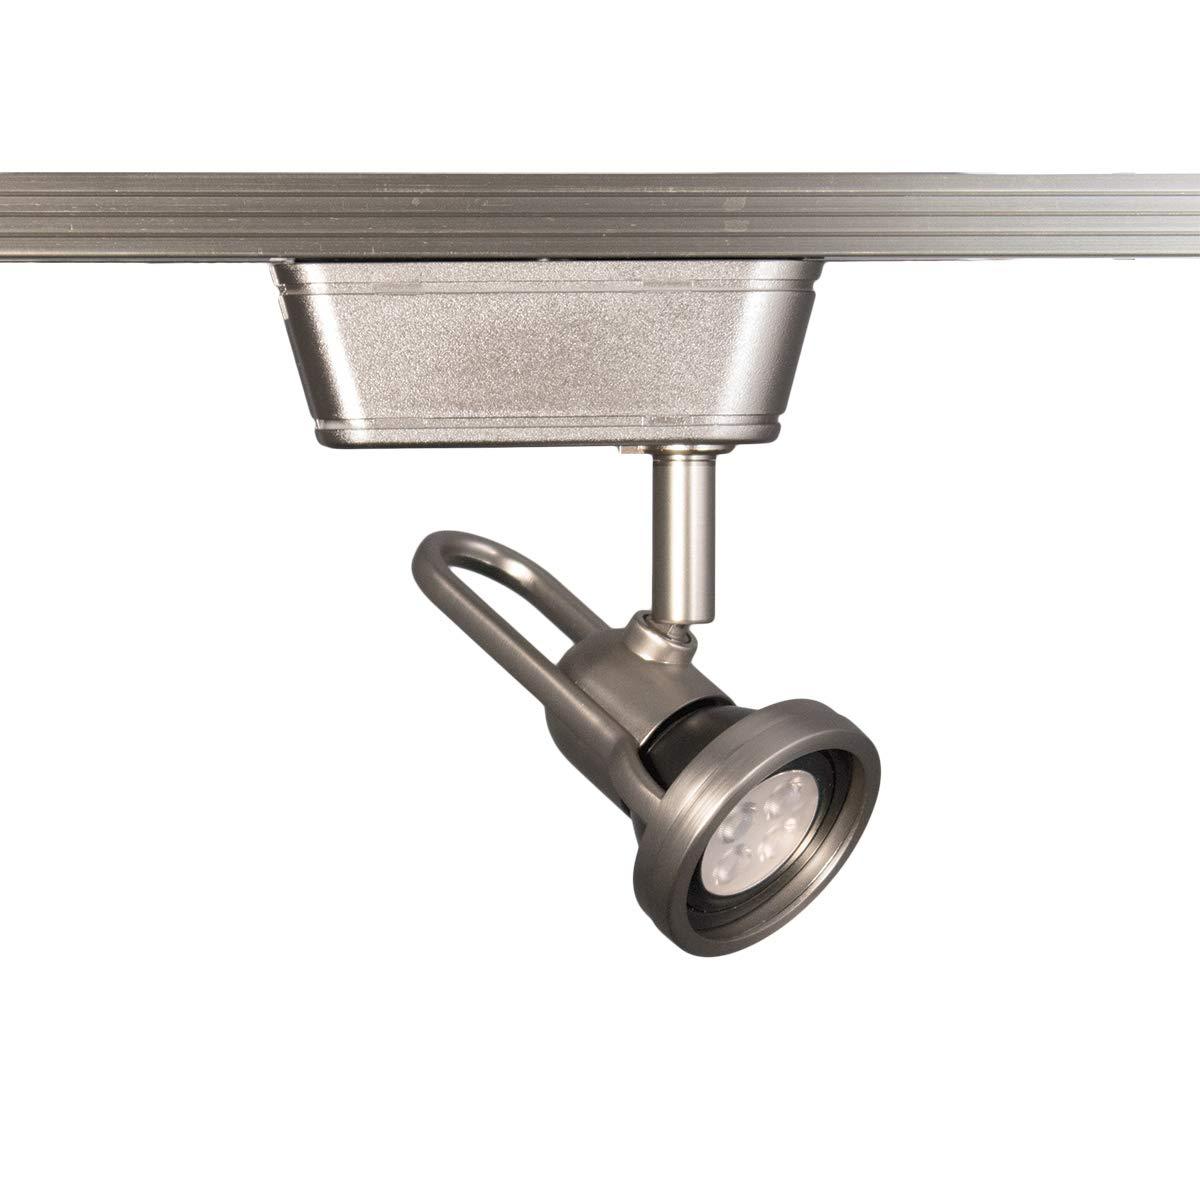 WAC Lighting HHT-826LED-BN Dune-Low Voltage LED 120V Luminaire H Track